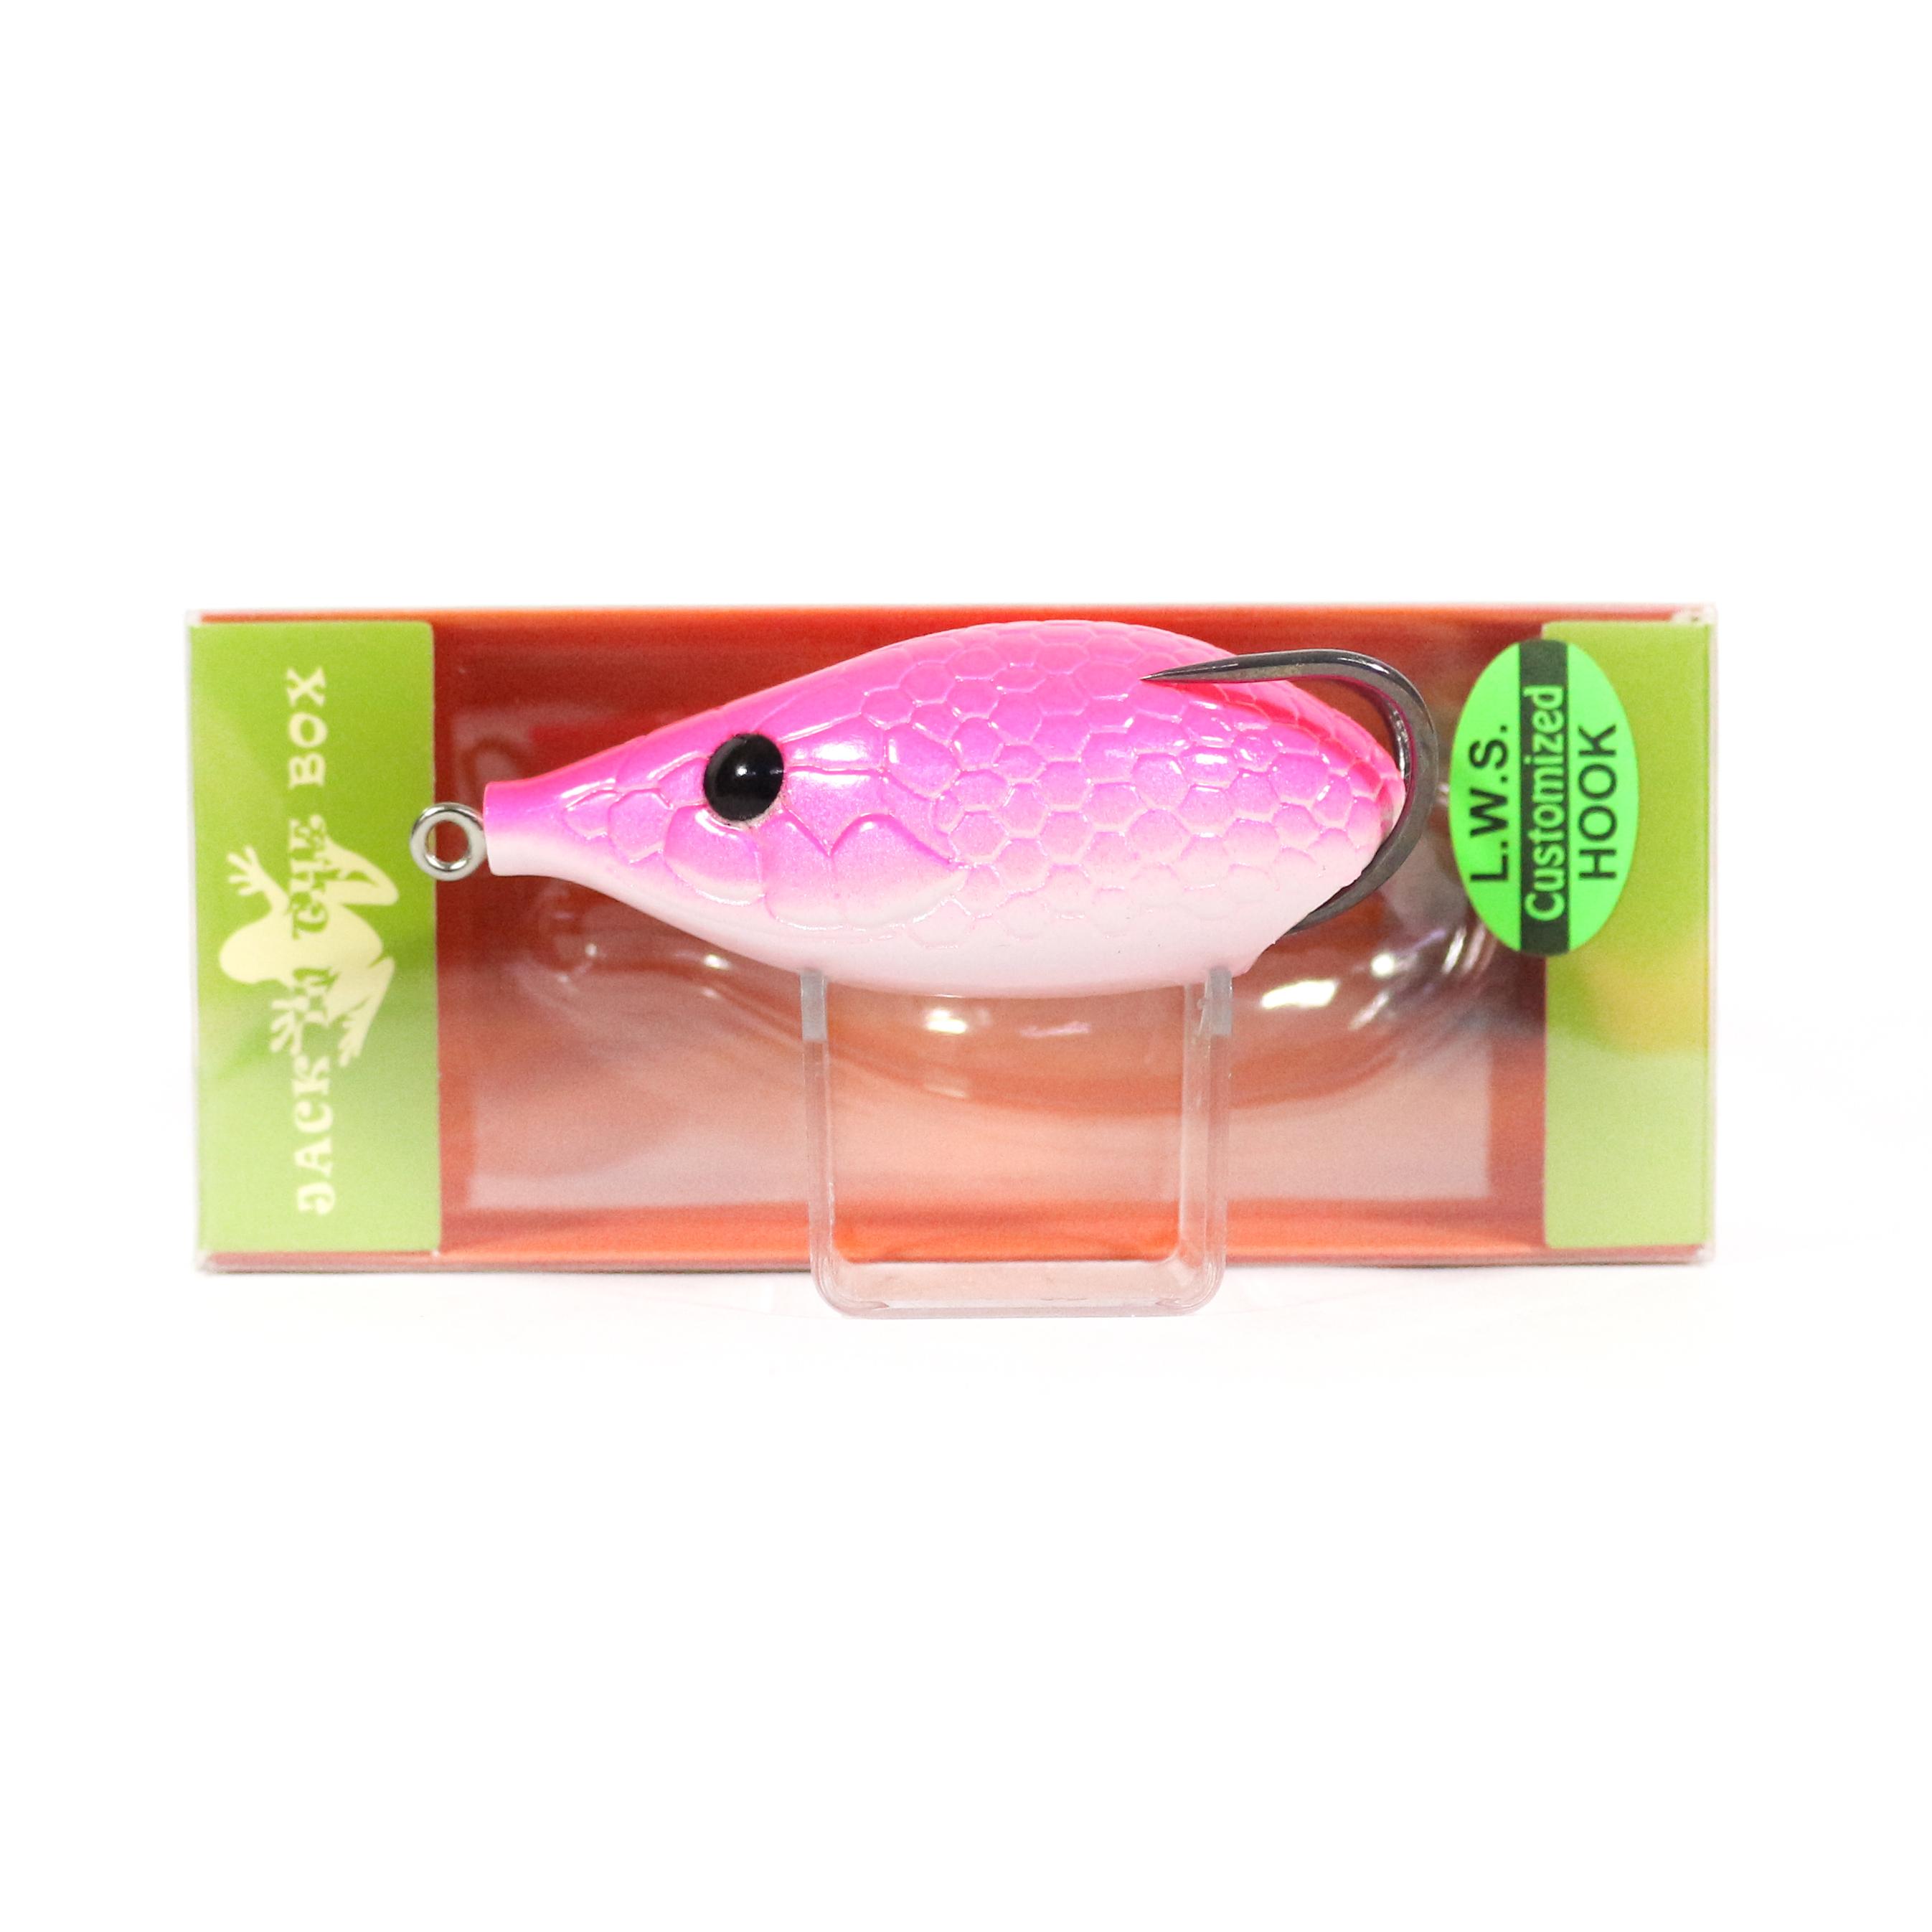 Finesse Tiny Anaconda Soft Plastic Floating Lure 27 (9568)